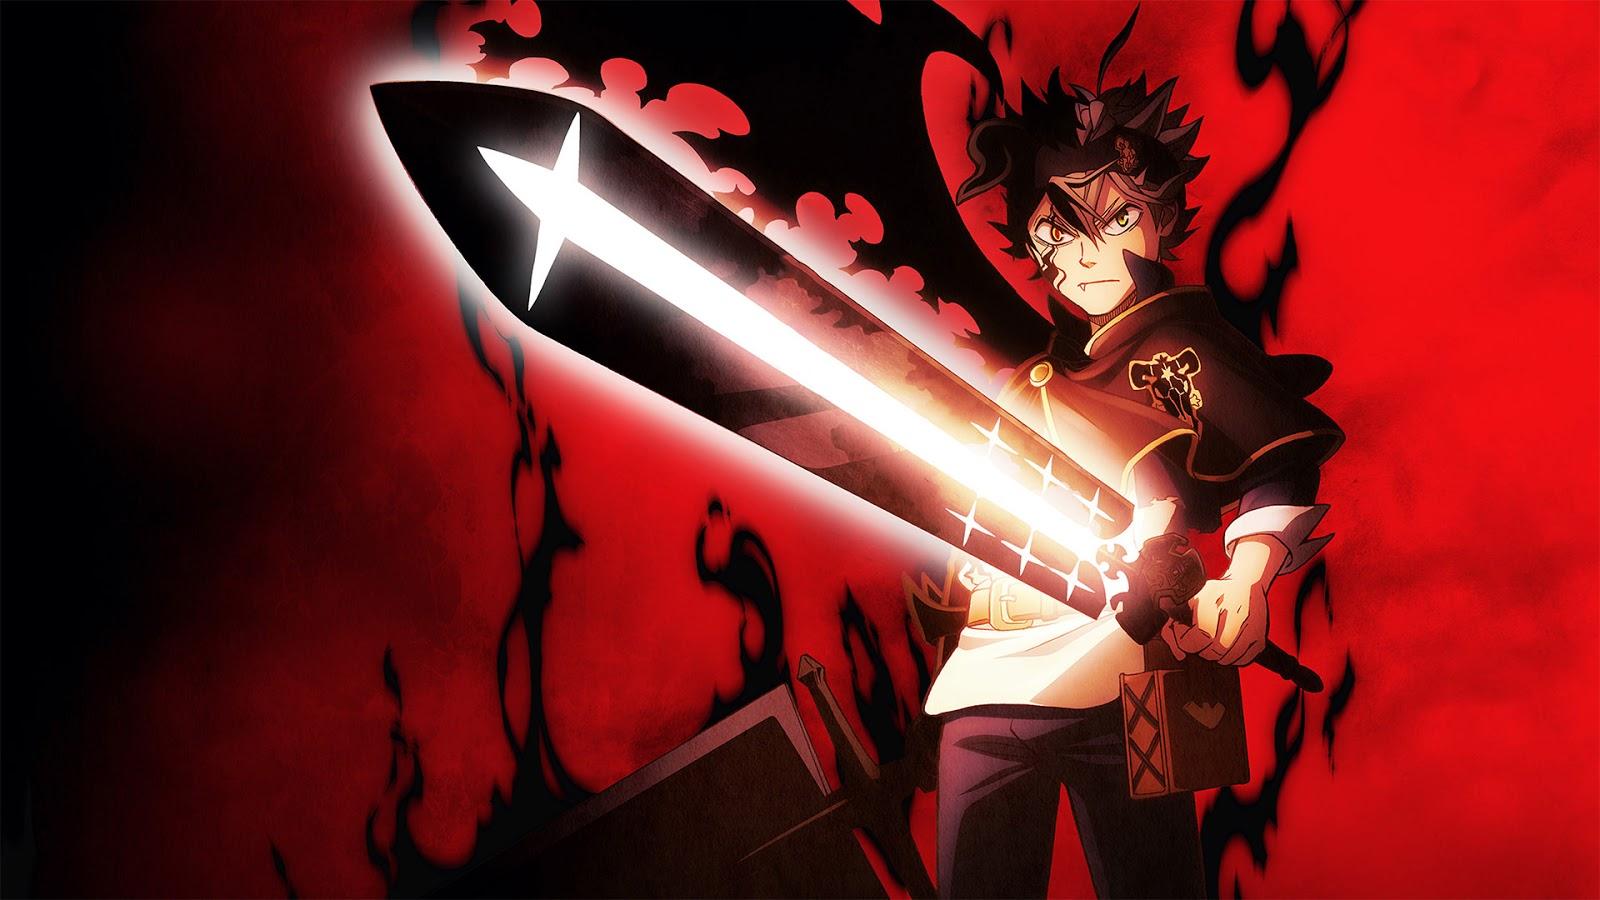 Bergenre action magic romance overpower shounen sampai tahun ini anime ini masih ongoing diadaptasi dari manga berceritakan tentang pemuda bernama